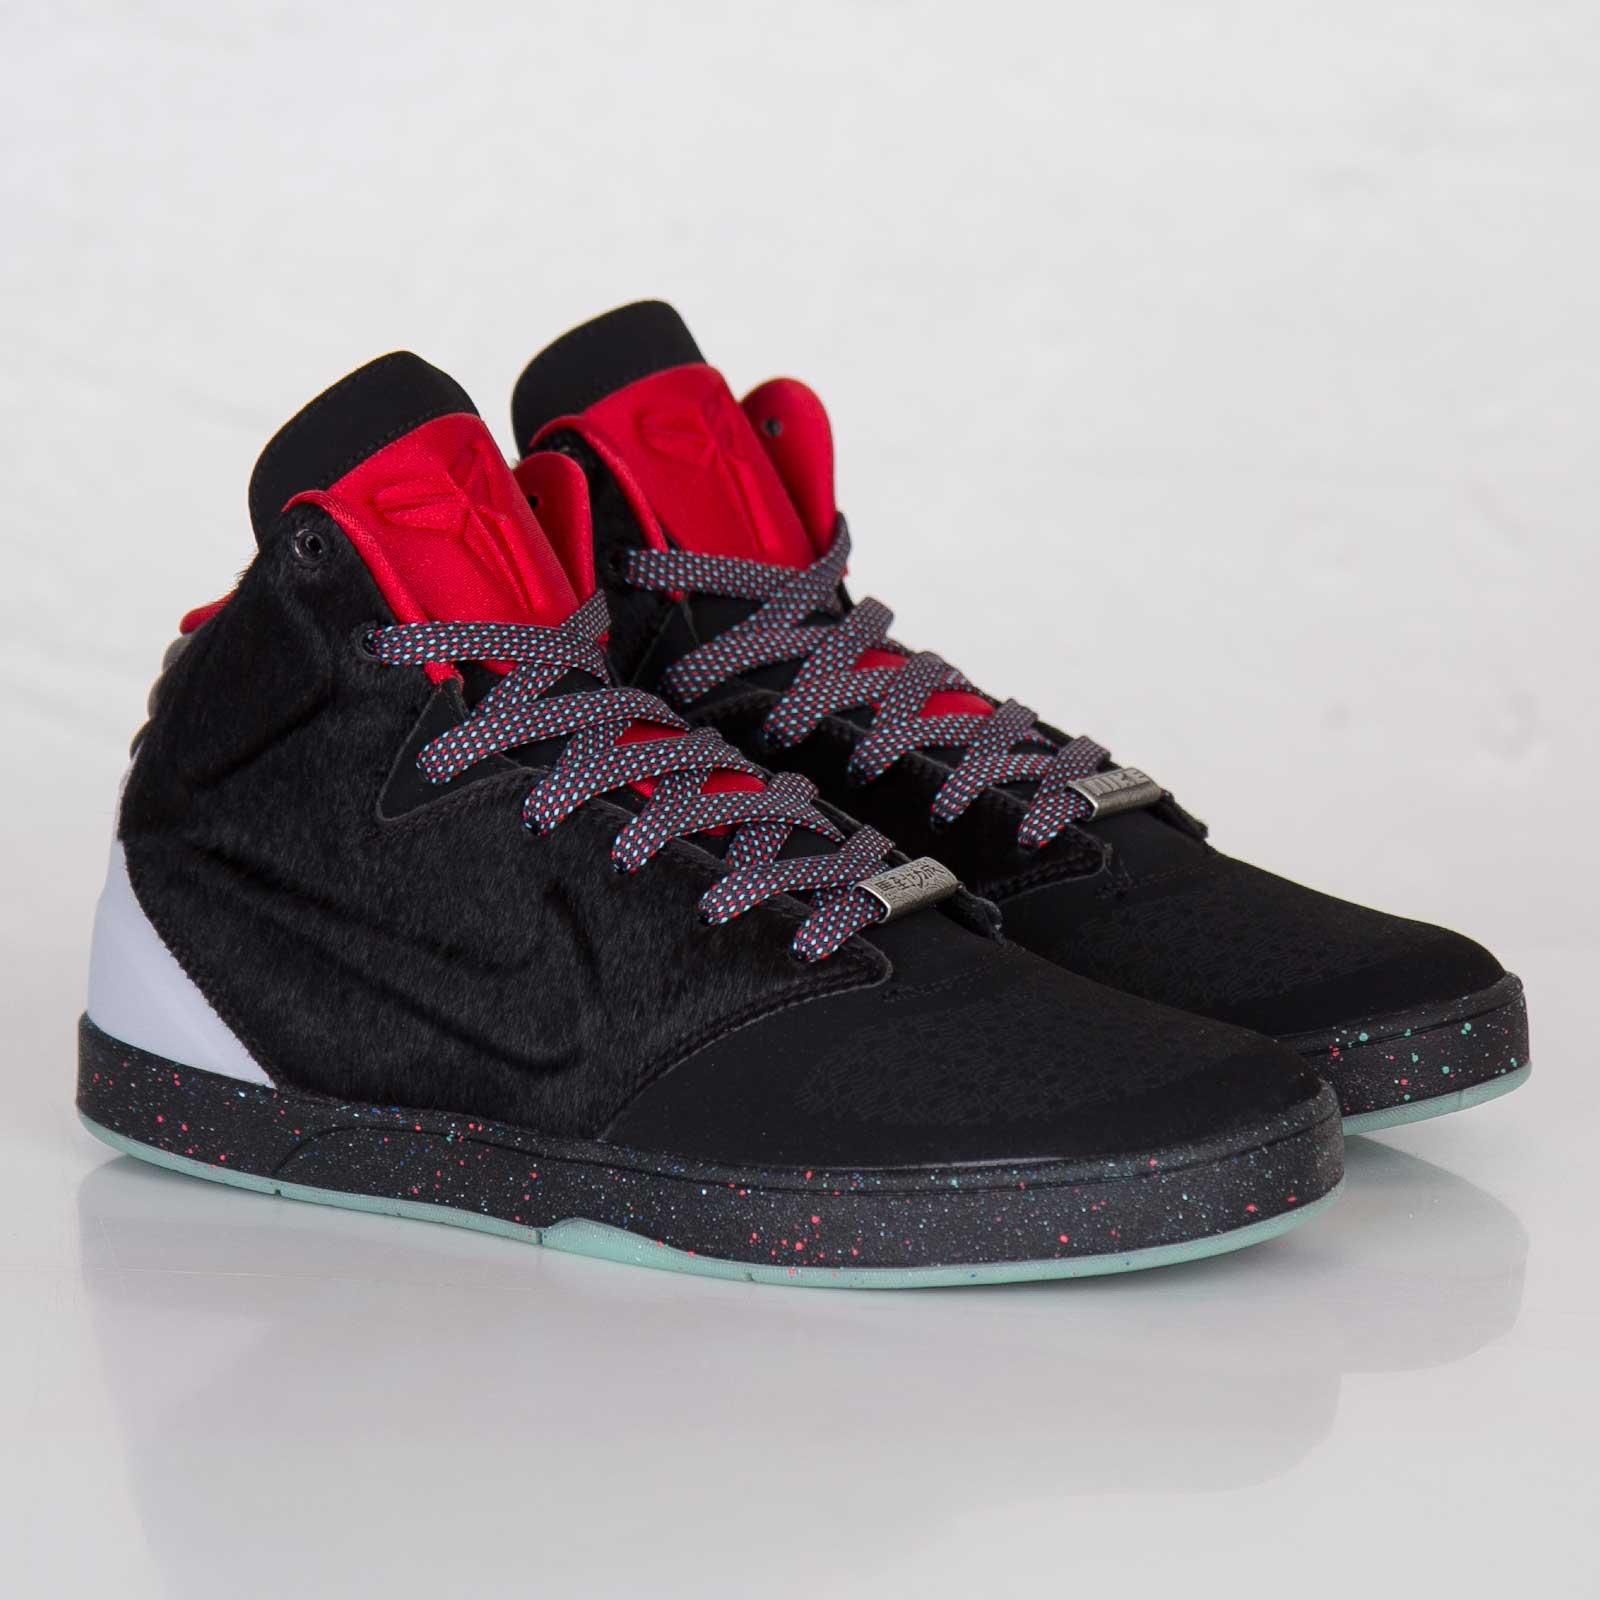 d3119964dfc Nike Kobe 9 NSW Lifestyle YOH QS - 647594-001 - Sneakersnstuff ...